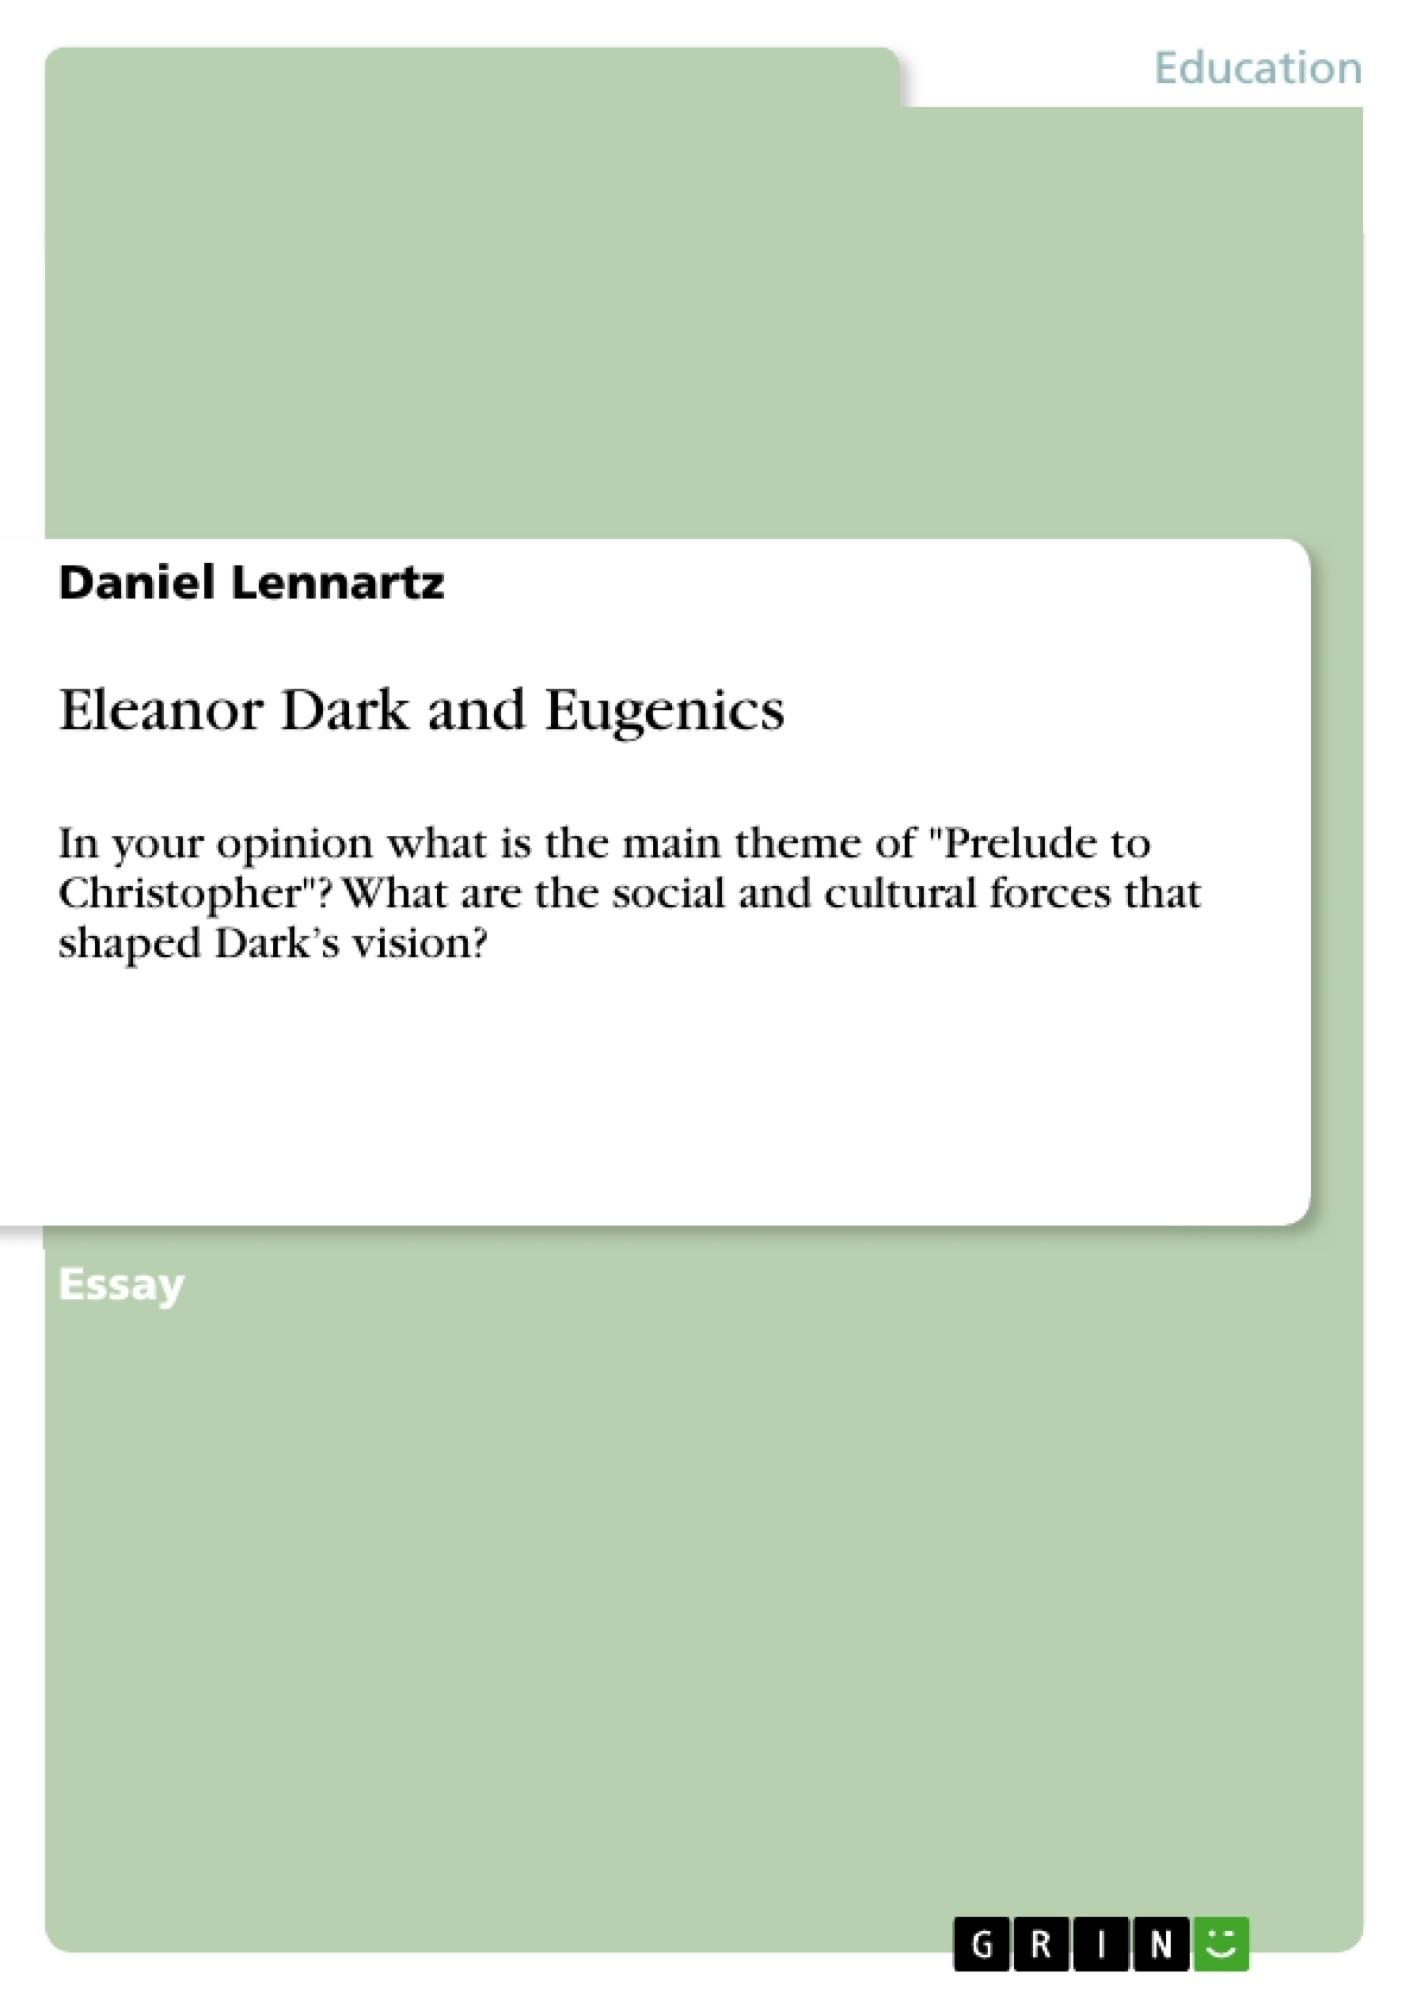 term paper on eugenics